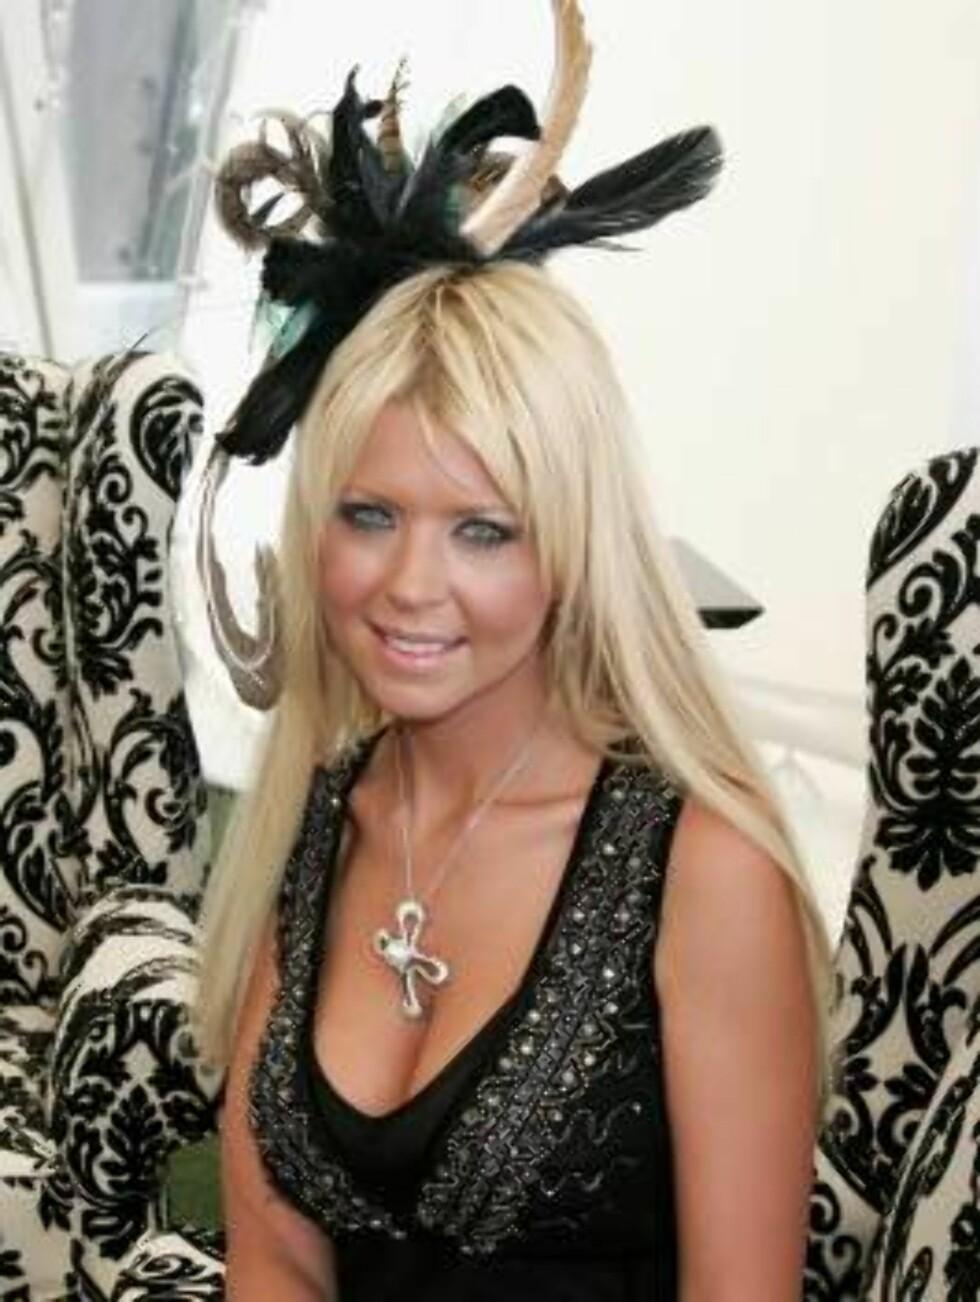 BRISBANE, AUSTRALIA - JANUARY 13:  Actress Tara Reid attends the Conrad Jupiter's Magic Millions Raceday at the Gold Coast Turf Club on January 13, 2007 in Brisbane, Australia.  (Photo by Patrick Riviere/Getty Images)72929145PR001_Tara_Reid_Att *** Local Foto: All Over Press